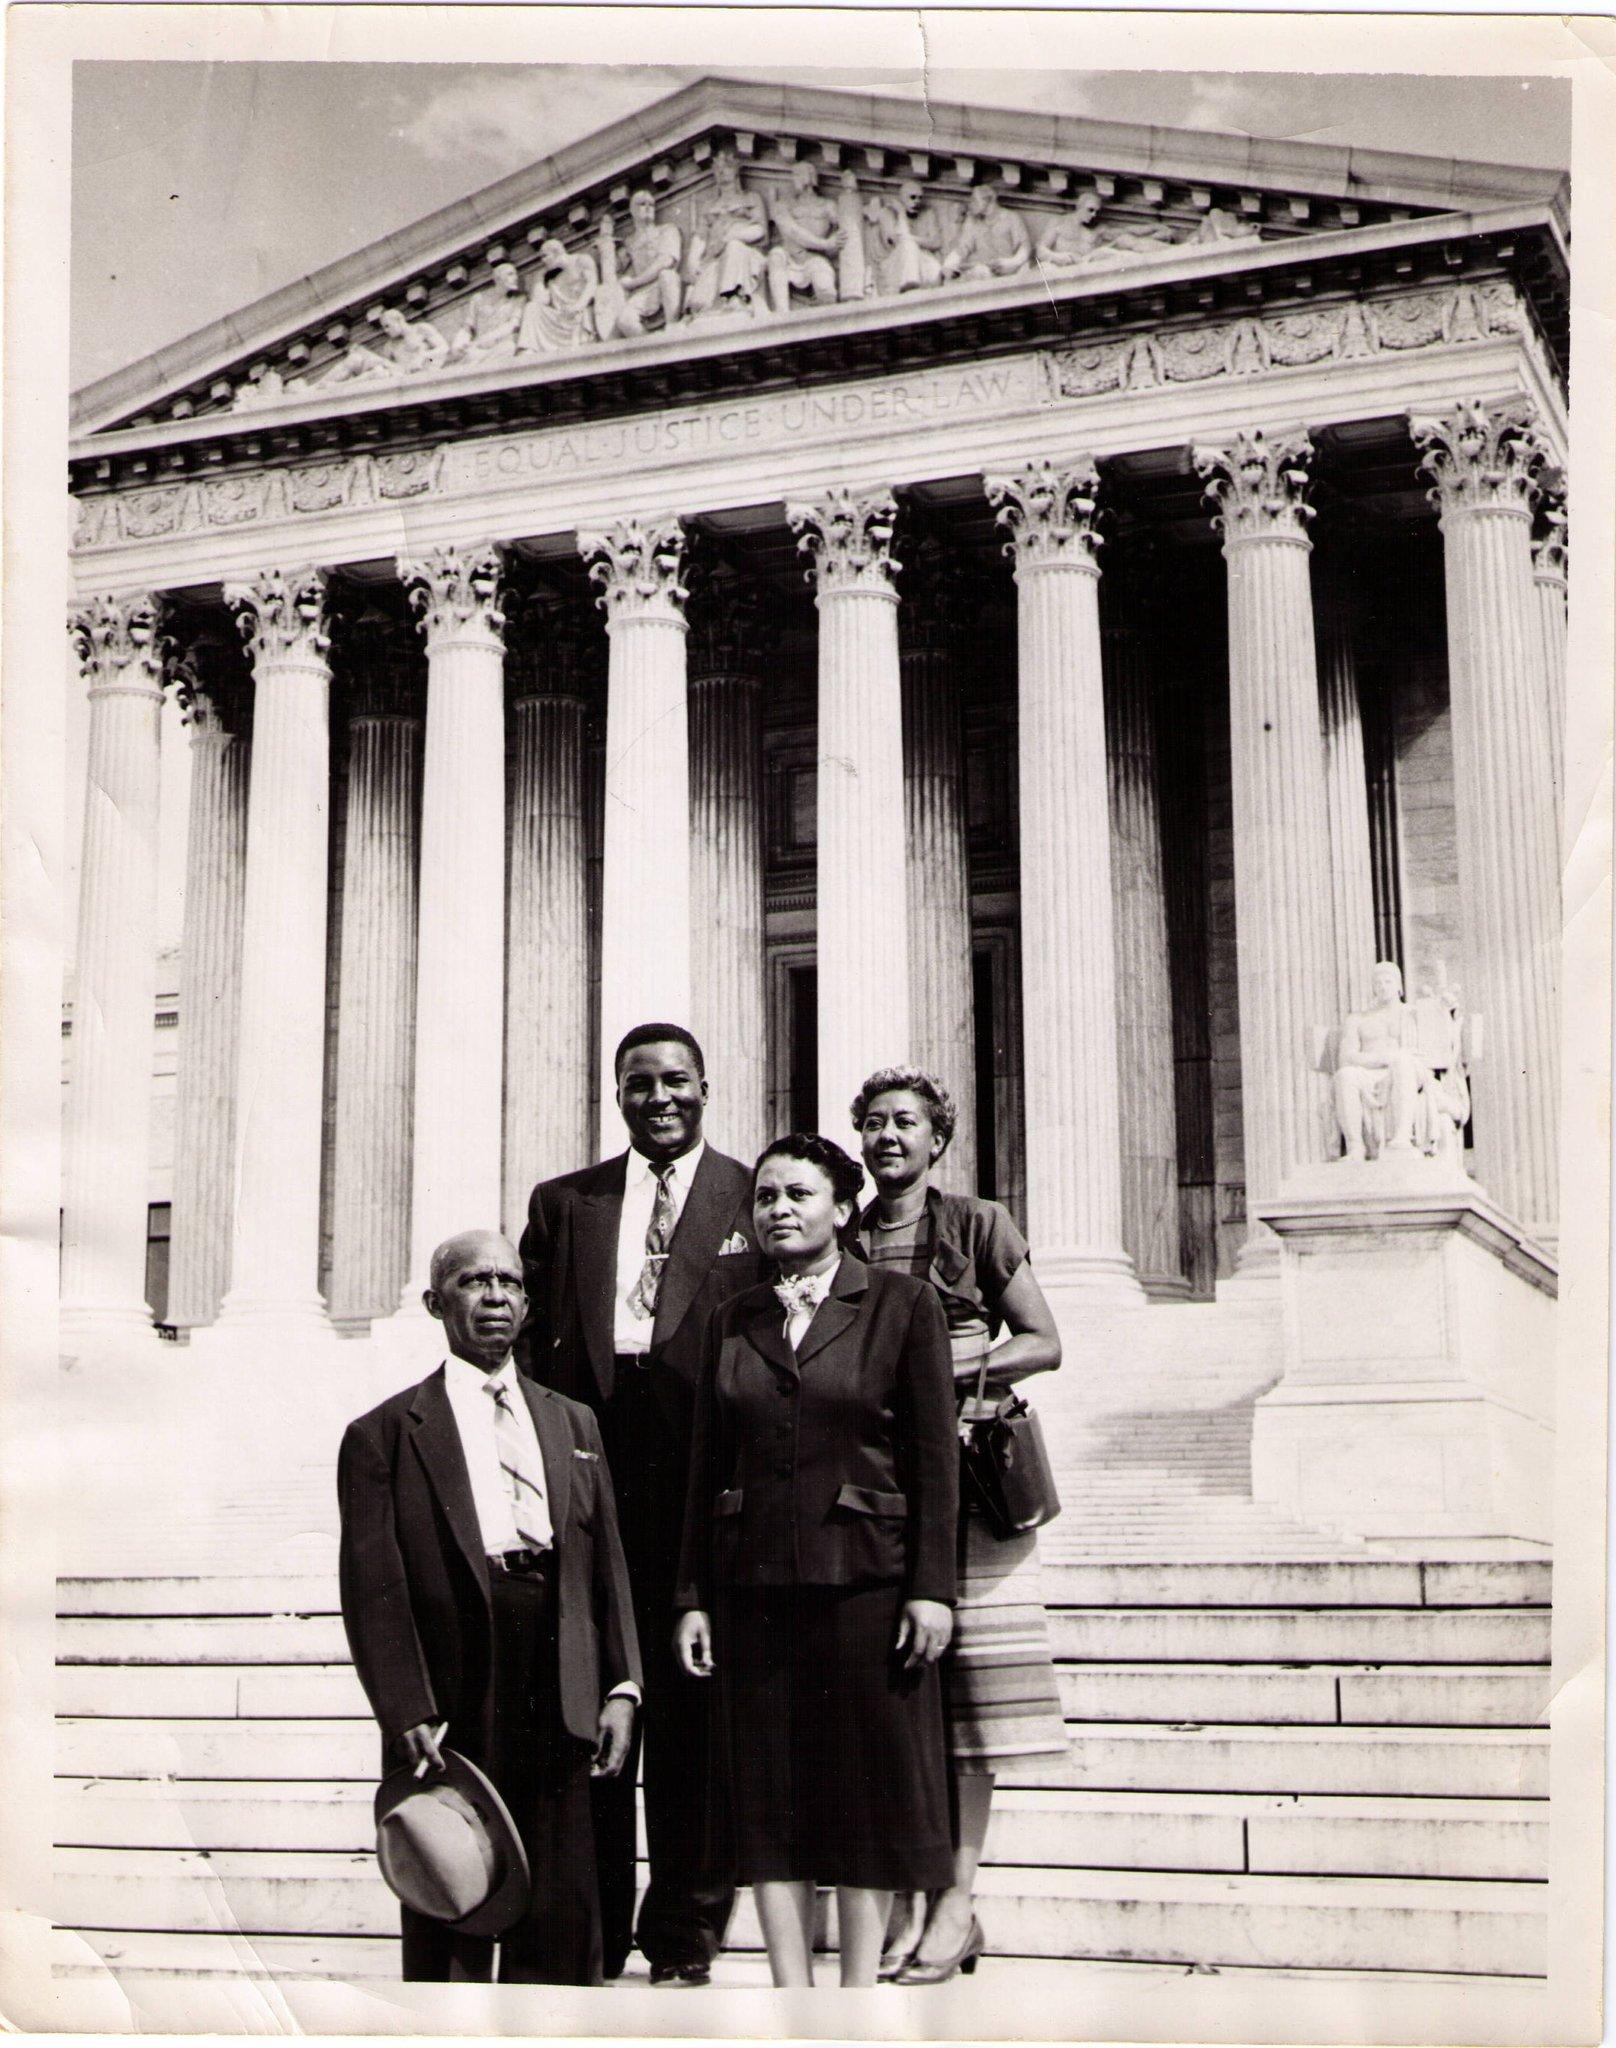 Dovey Johnson Roundtree, African American History, Black History, African American Laws, Criminal Justice Reform, KOLUMN Magazine, KOLUMN, KINDR'D Magazine, KINDR'D